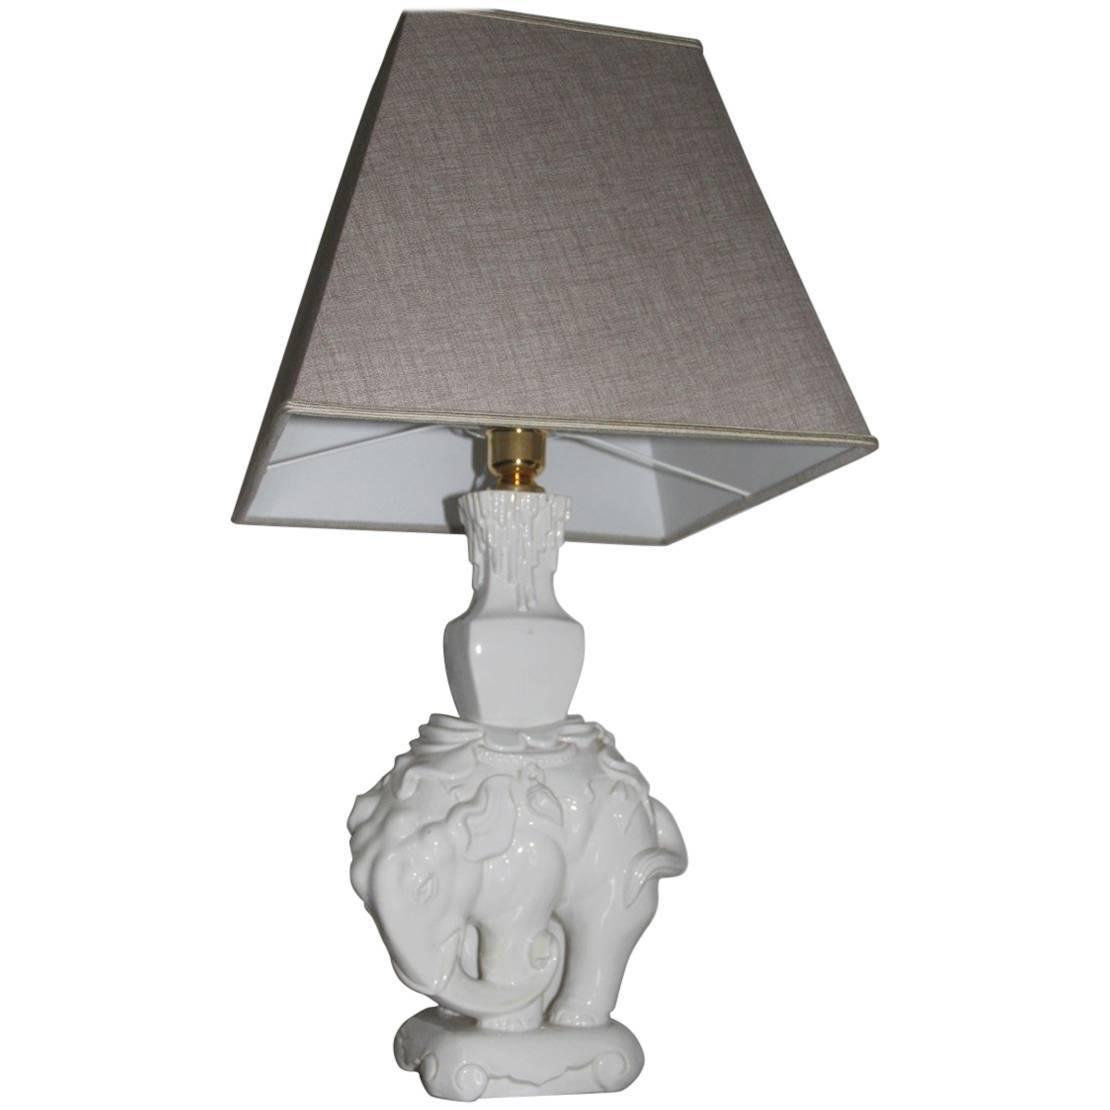 Italian Ceramic Elephant Table Lamp, 1970s Fabric dome